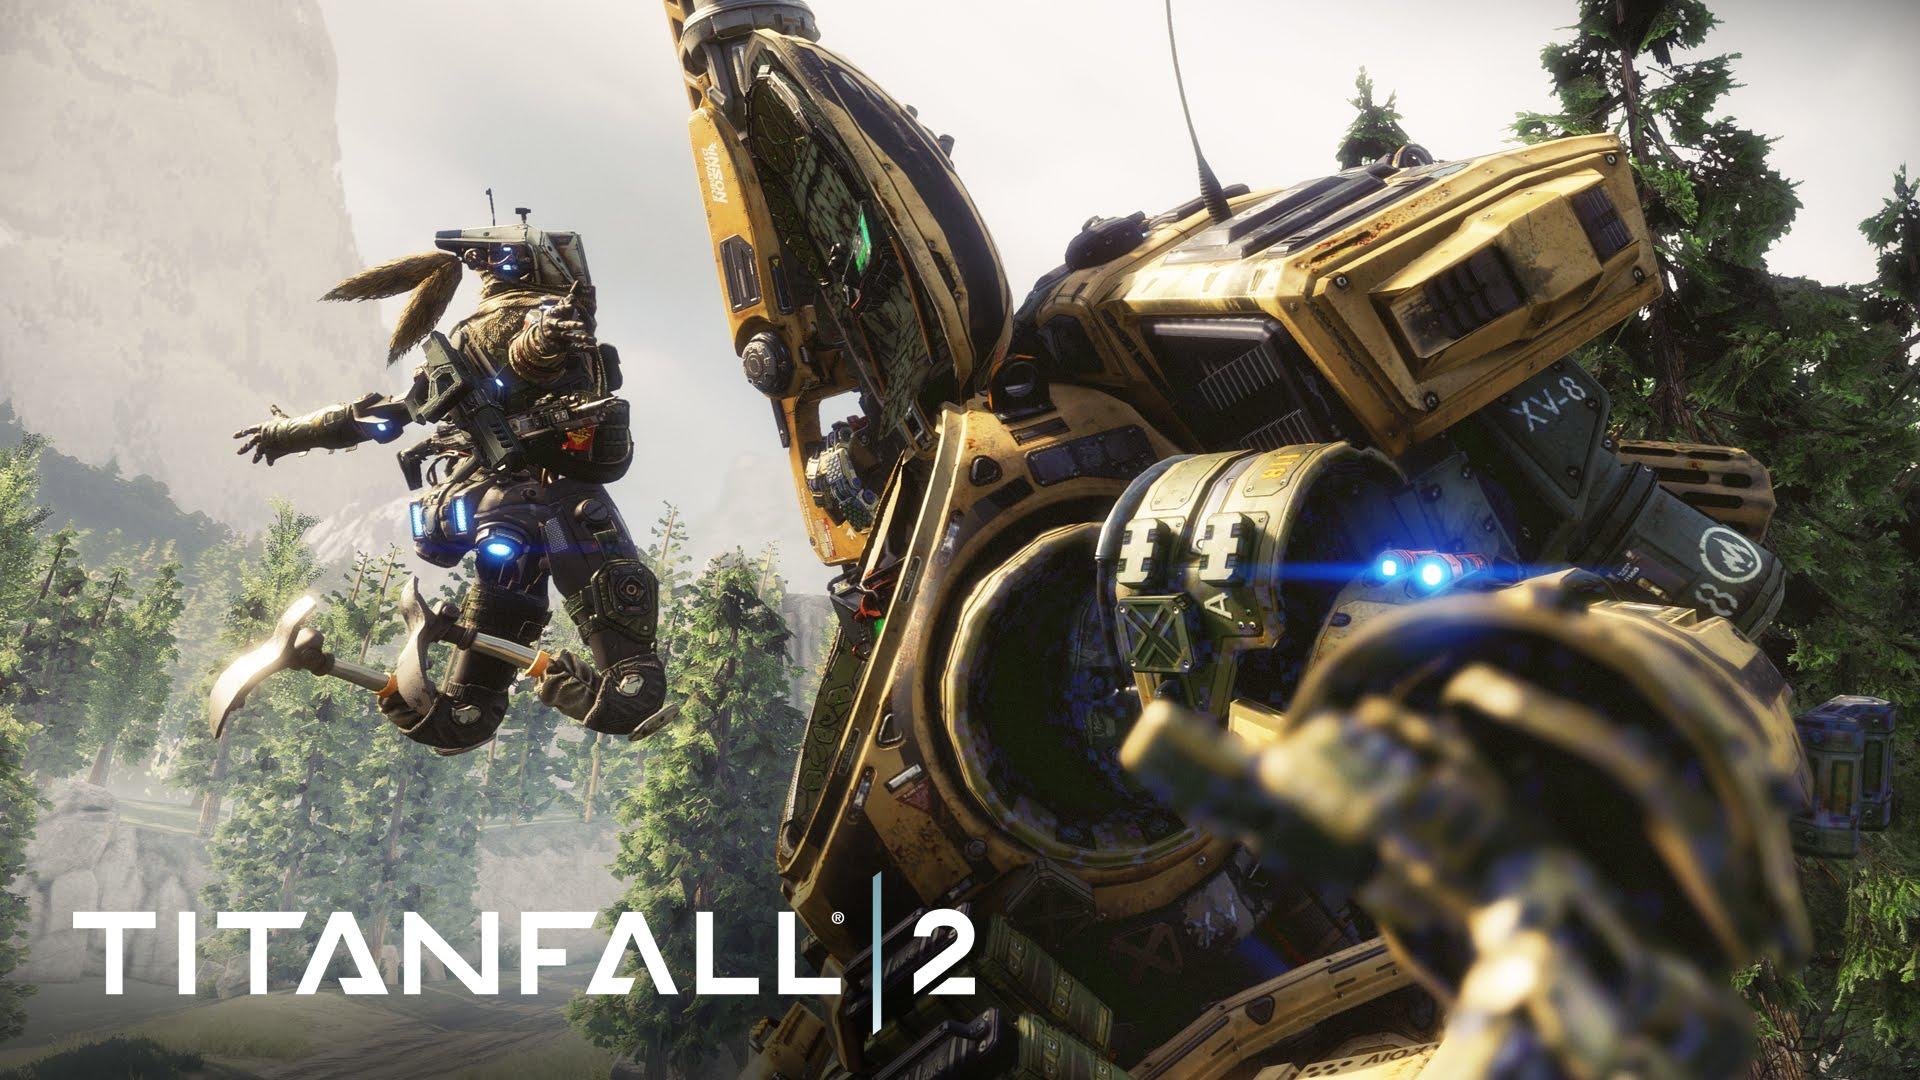 titanfall-2-ps4-pro-gamersrd-com